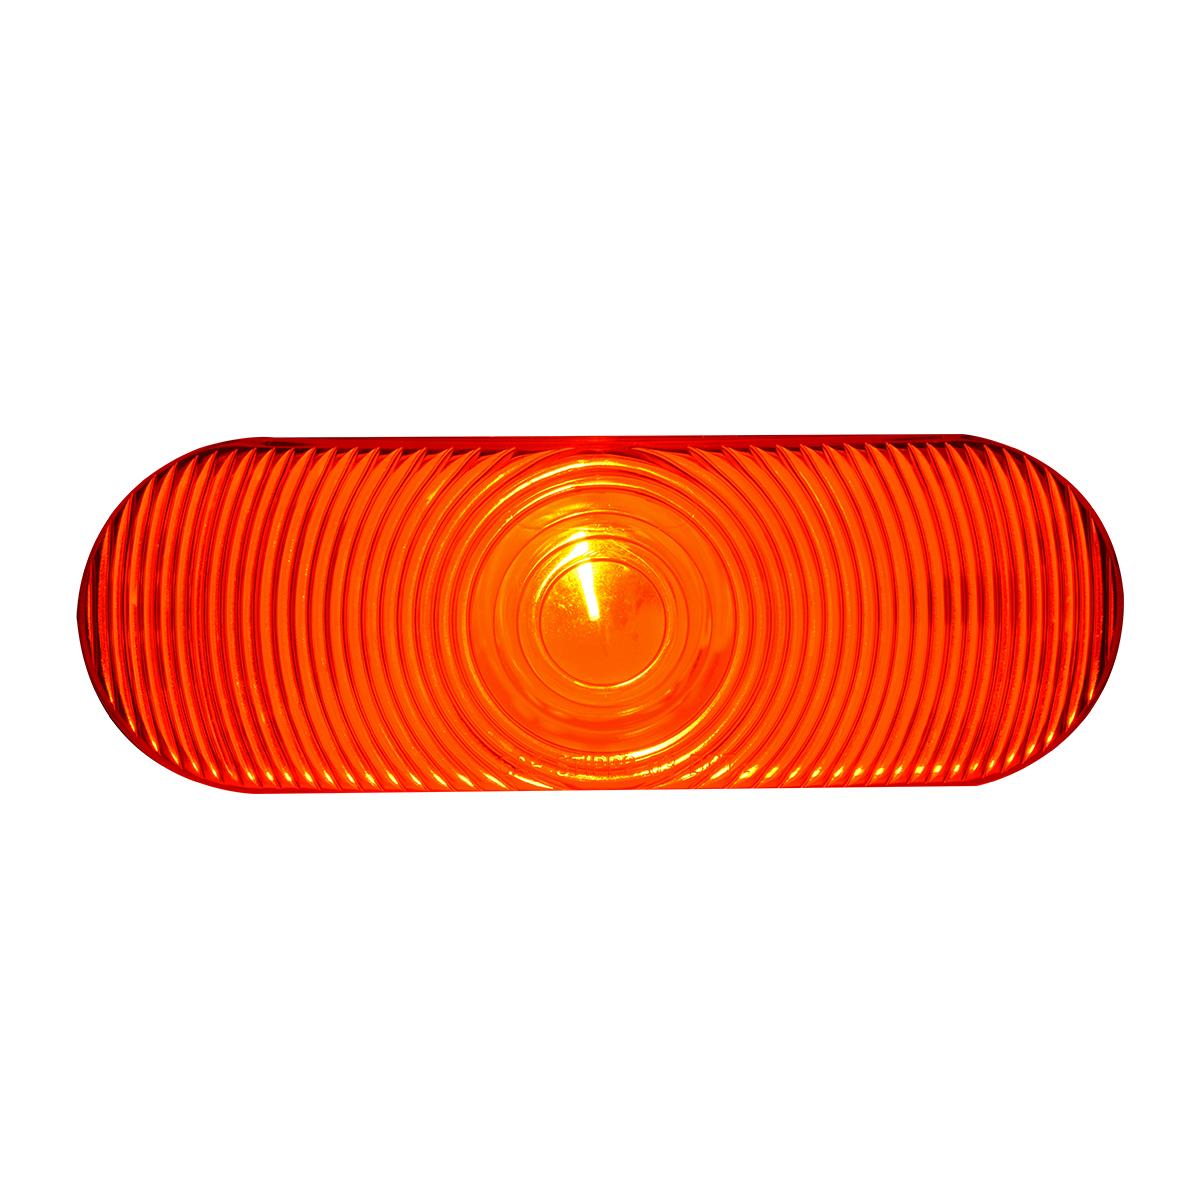 #80805 - Oval Sealed Incandescent Flat Red/Red Light - Slanted